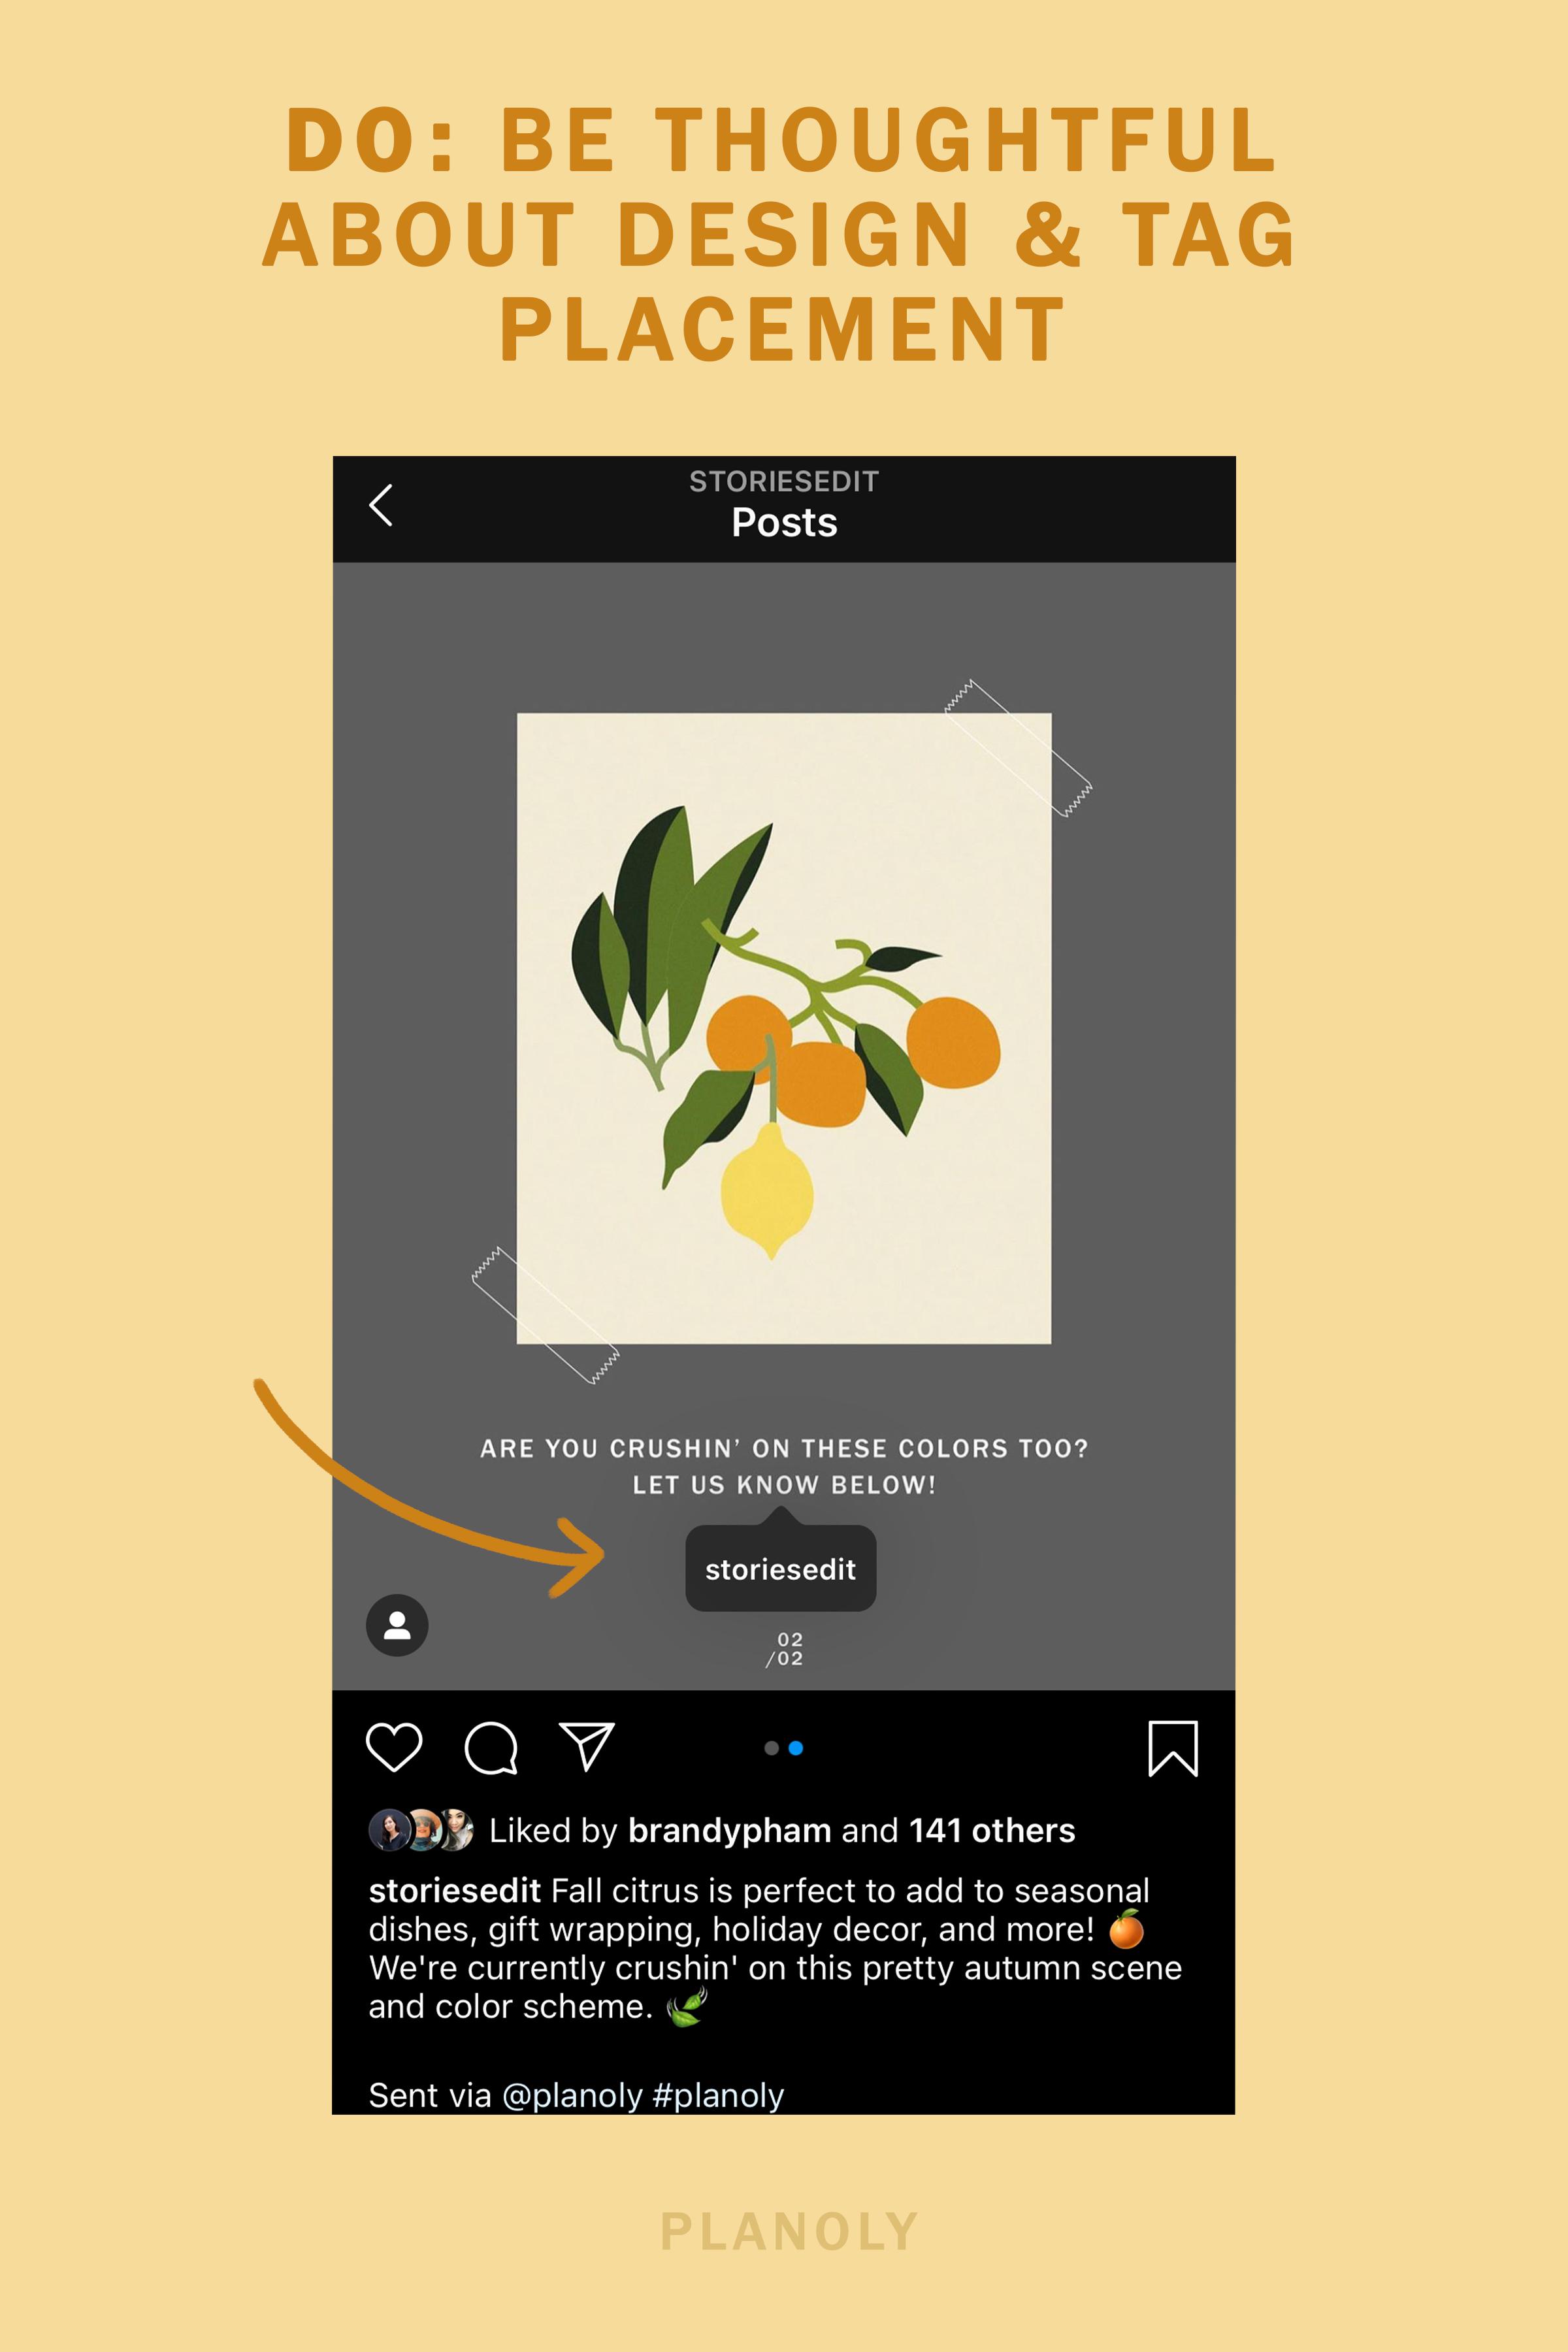 PLANOLY-Blog Post-Intagram Best Practices for Designers-Image 4